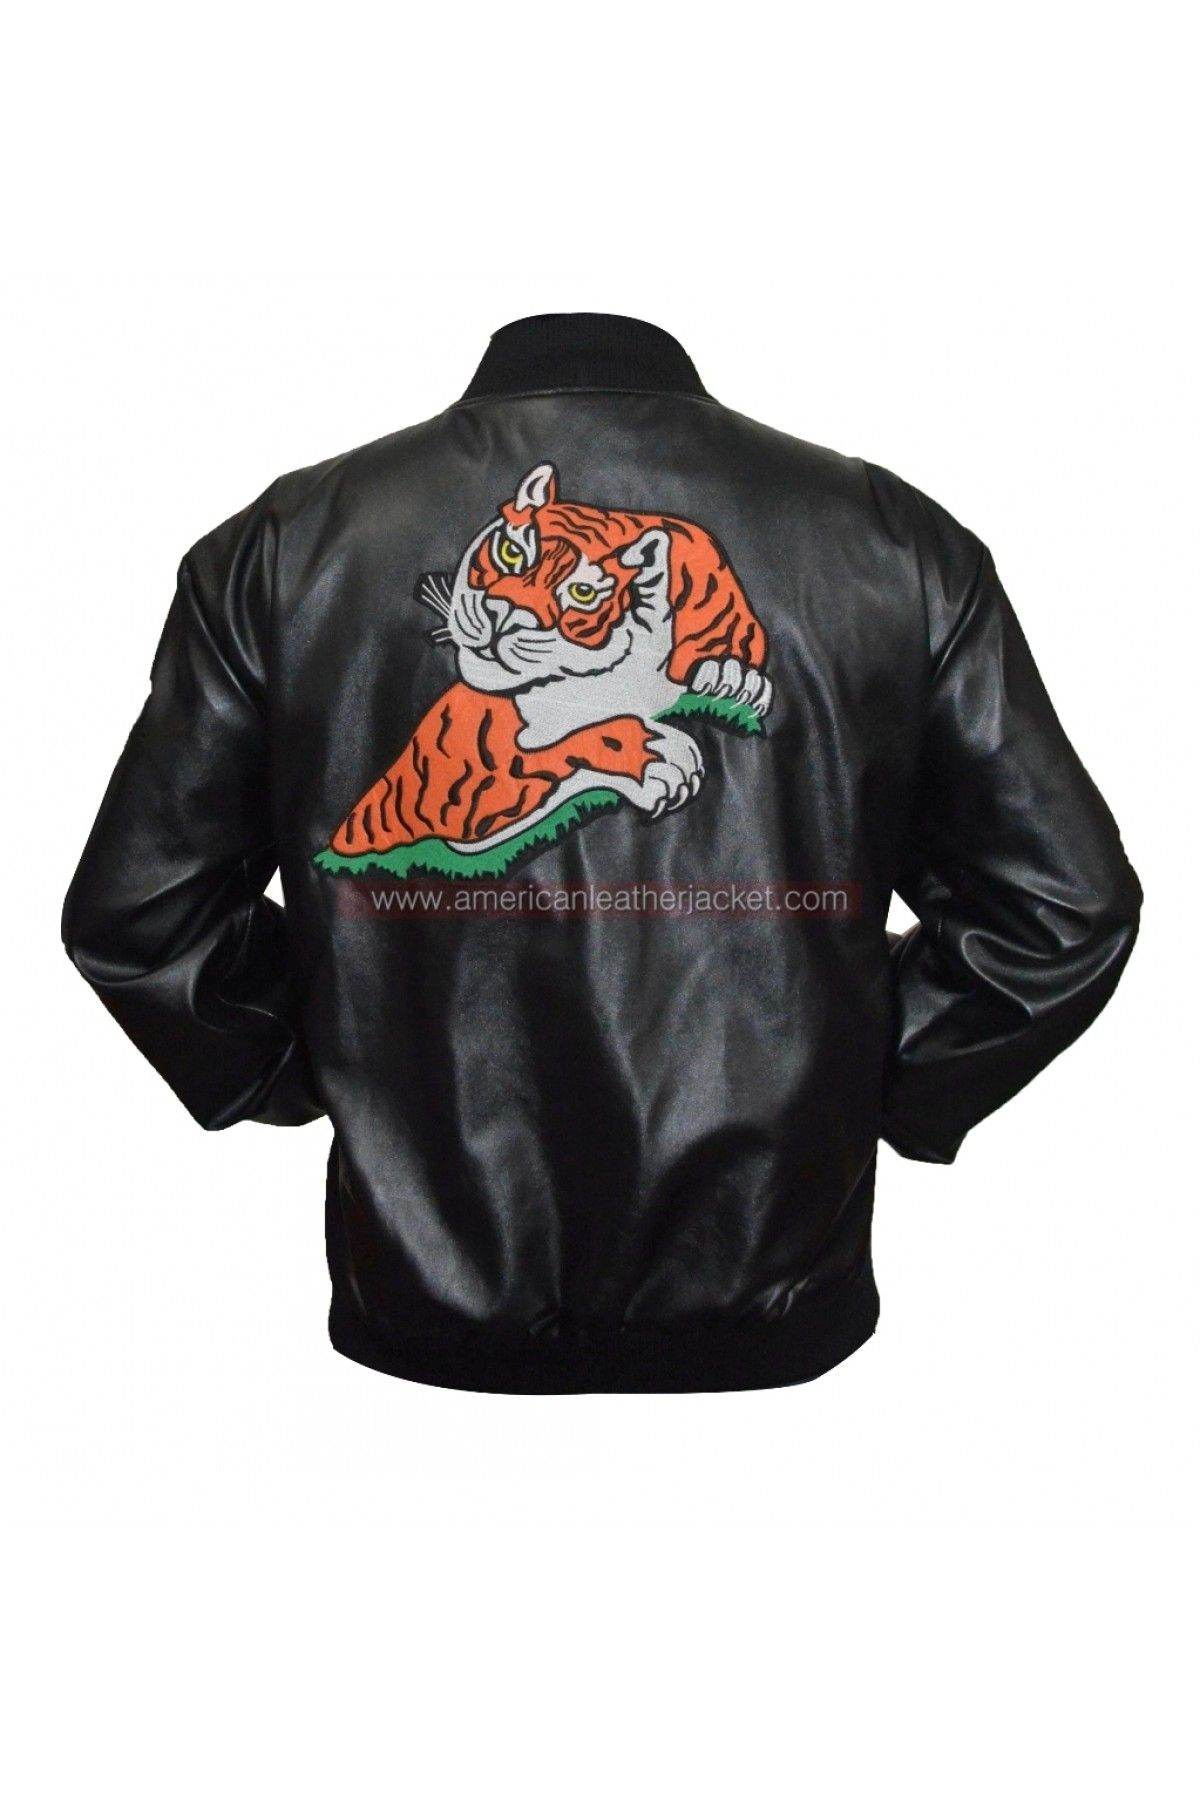 Rocky Ii Tiger Rocky Balboa Leather Jacket Rocky Ii Leather Jacket Rocky Balboa [ 1800 x 1200 Pixel ]